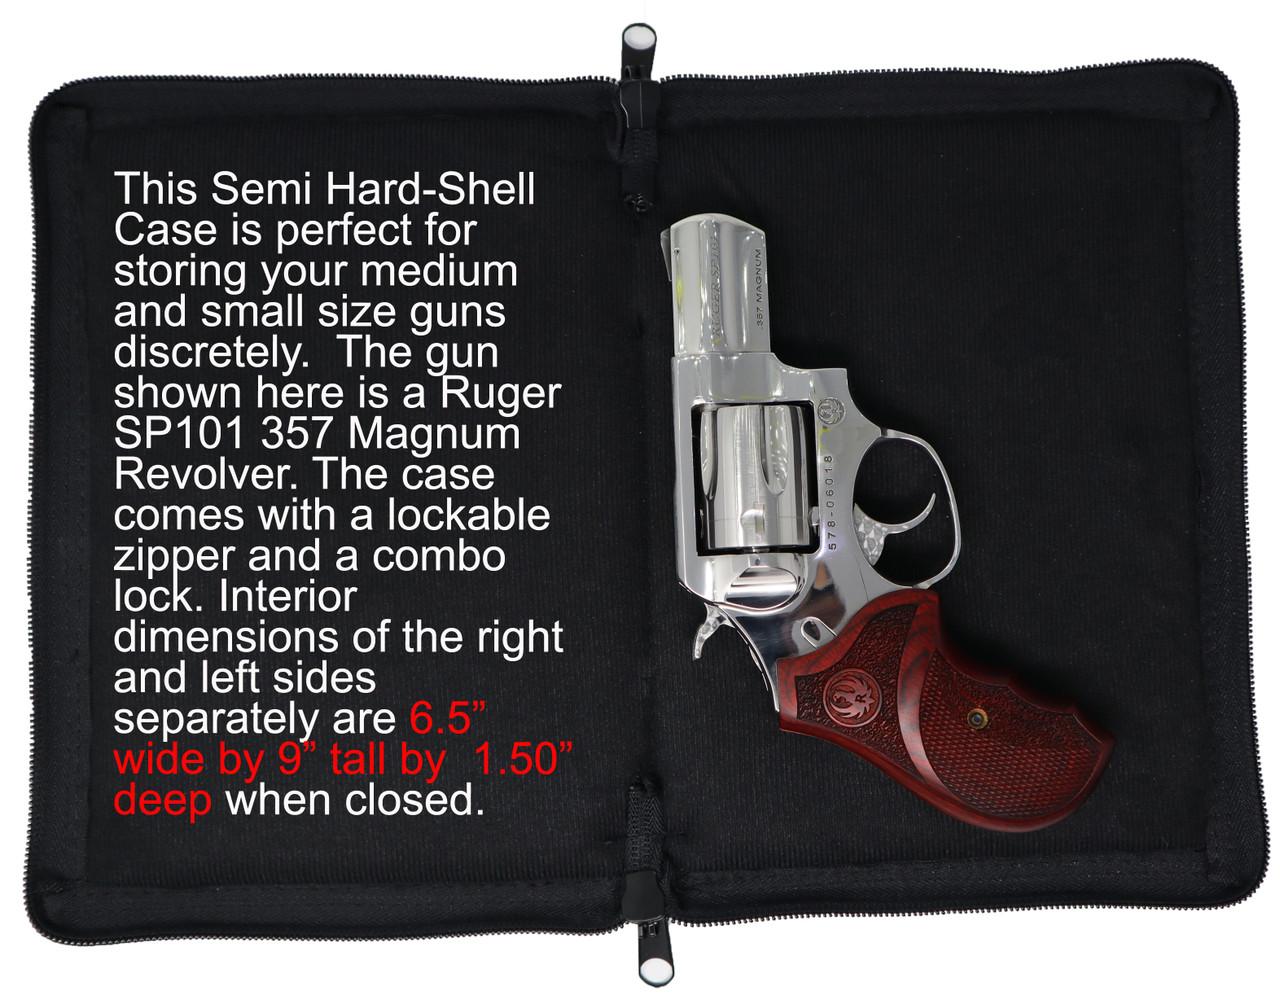 Garrison Grip Lockable CCW Or Bookshelf Bible Semi Hard Shell Gun Case For  Medium to Small Sized Guns (GTM)